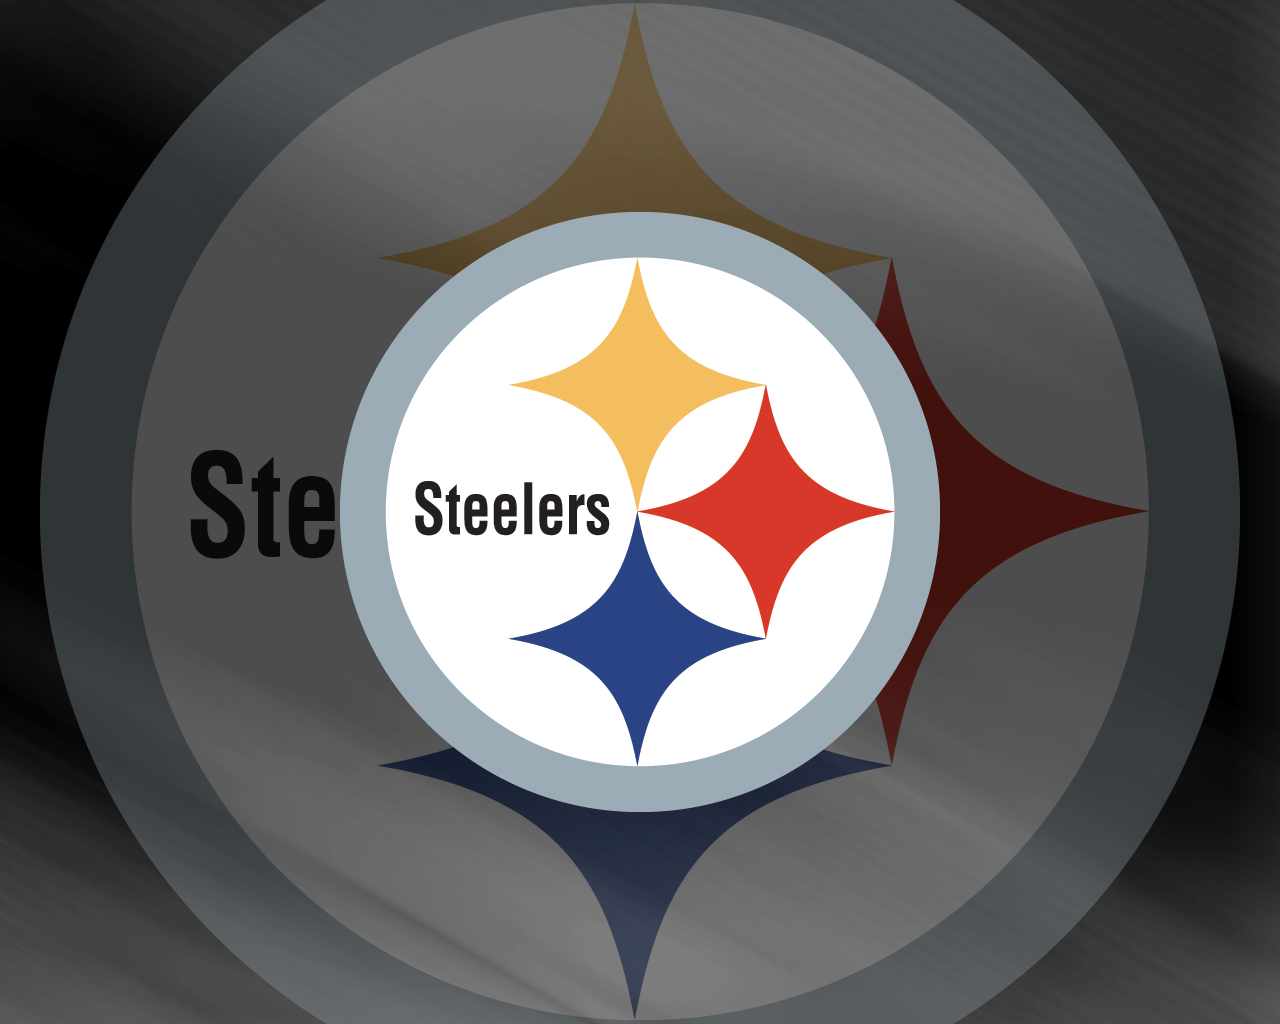 Pittsburgh Steelers wallpaper desktop wallpapers Pittsburgh Steelers 1280x1024